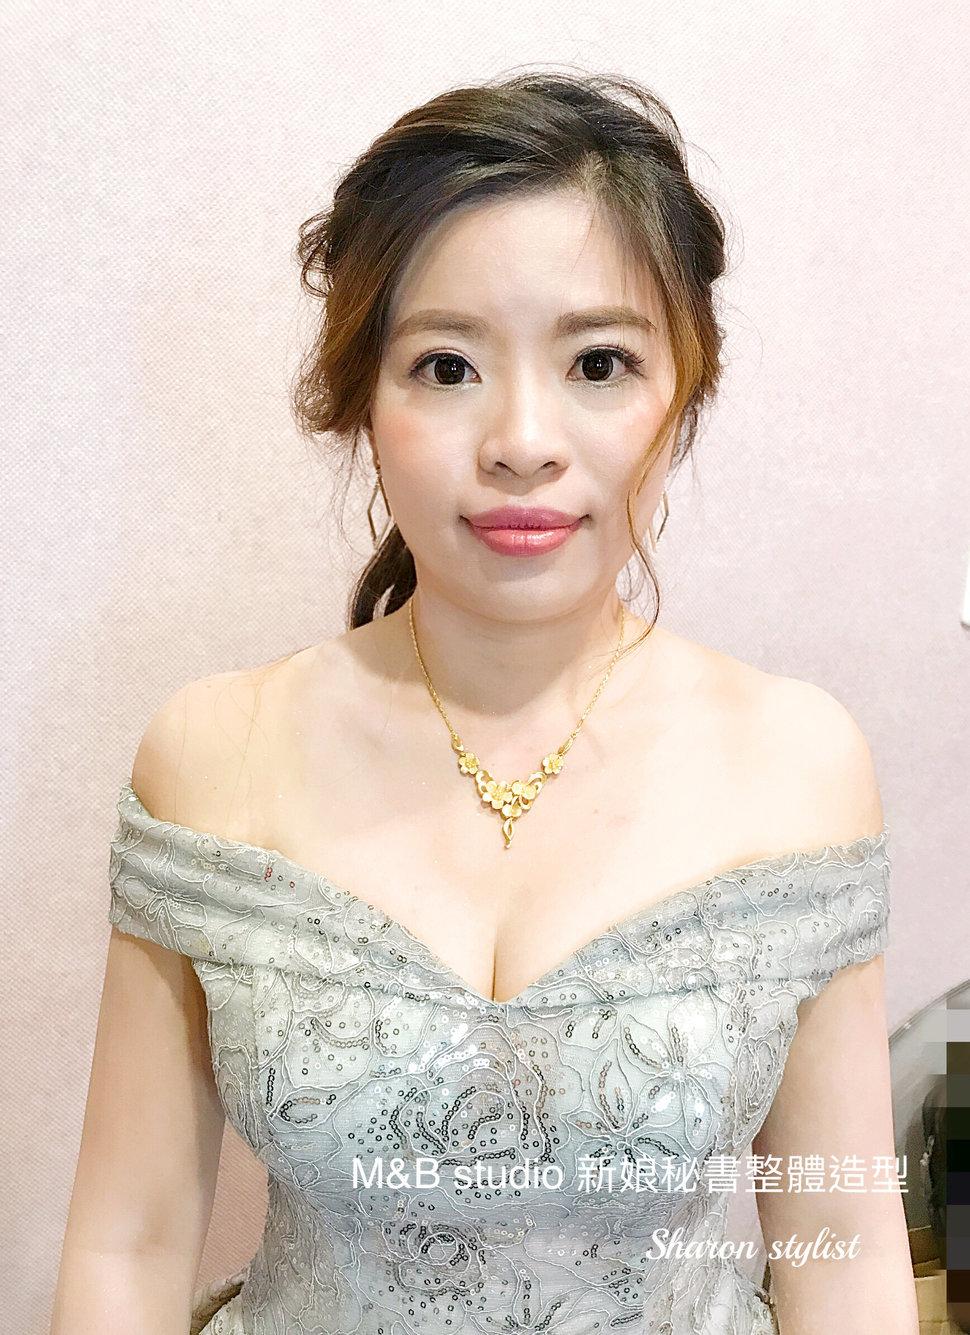 IMG_2588 - M&B STUDIO 新娘秘書整體造型 - 結婚吧